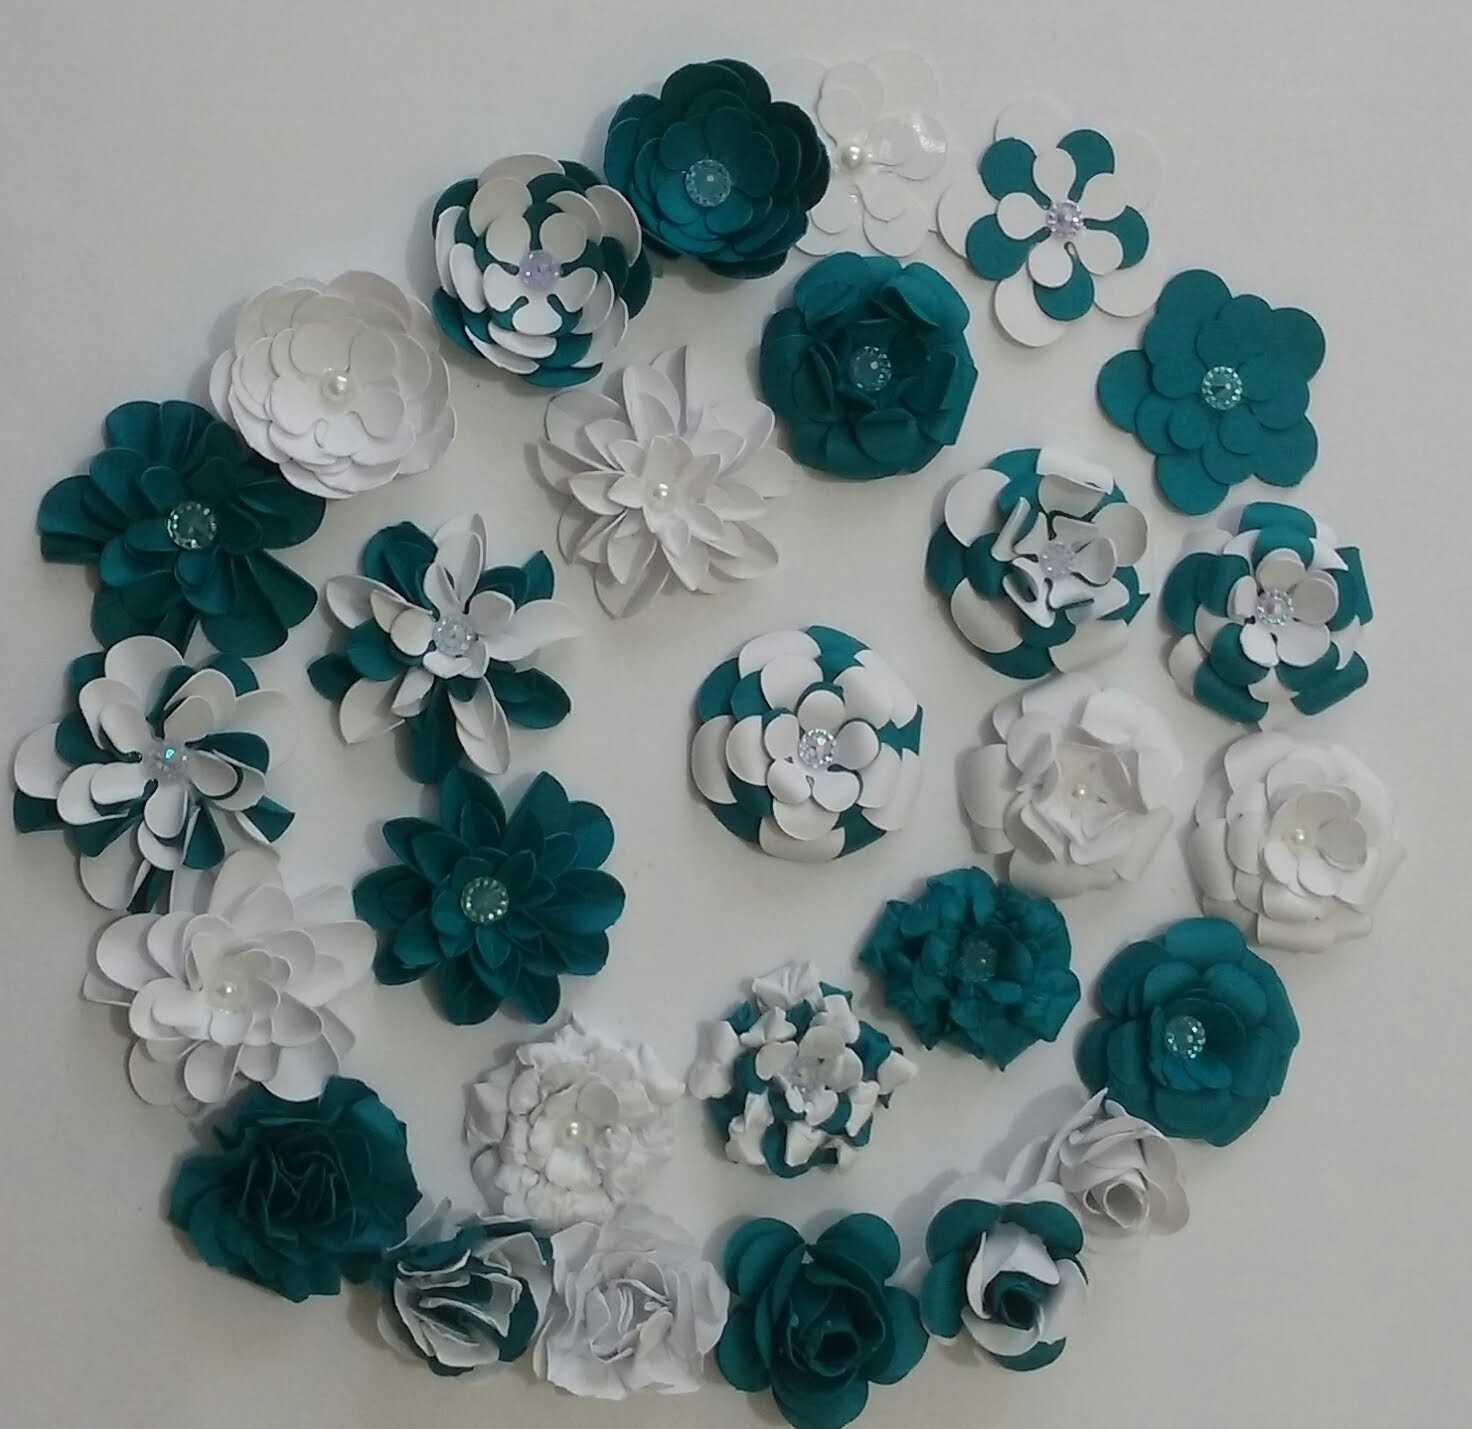 Flores de scrapbooking 1 - Aula parte única